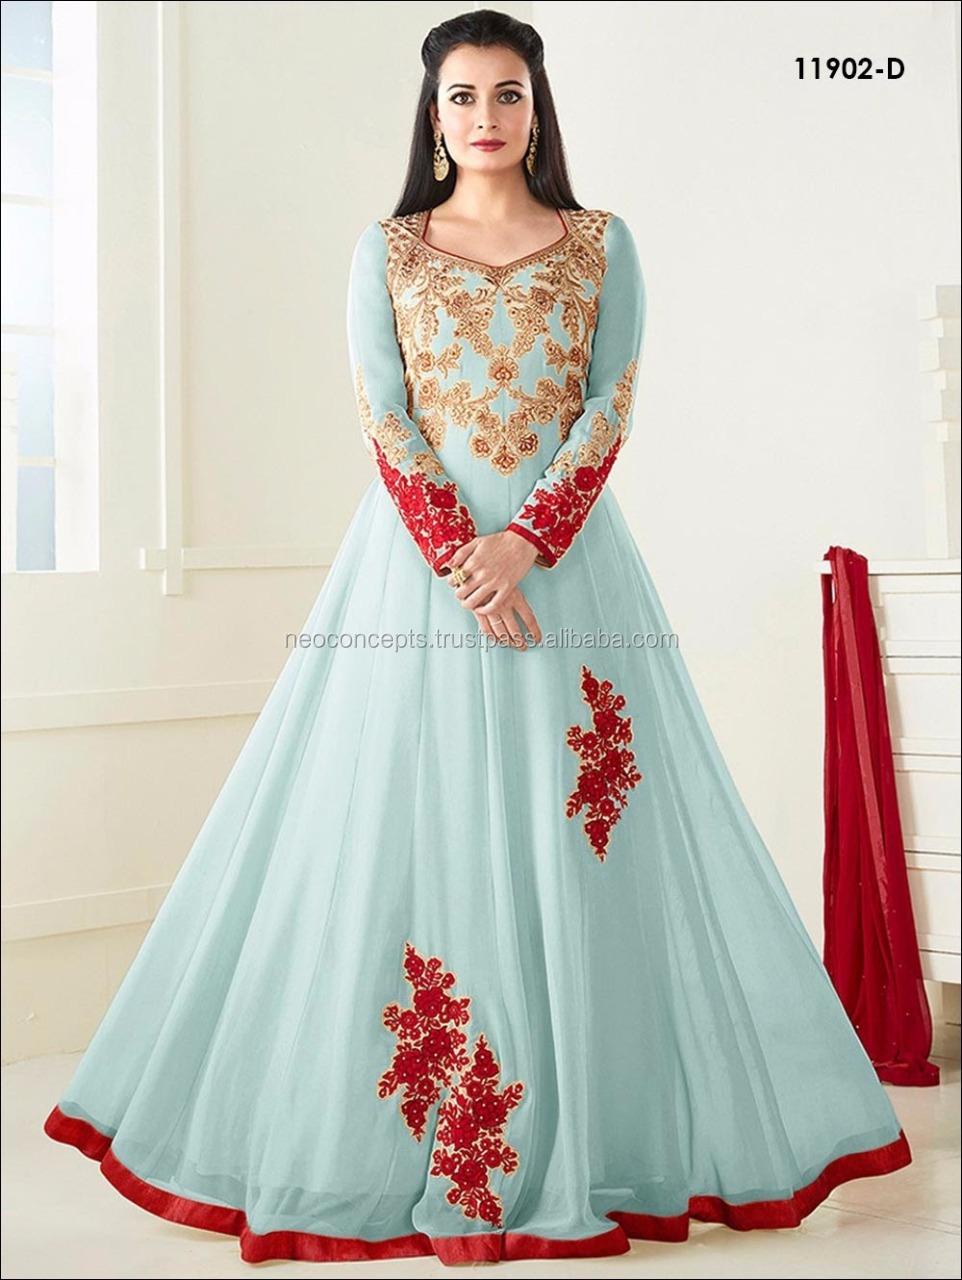 Bollywood Indian Anarkali Dress / Ladies Winter Suit Salwar Kameez ...